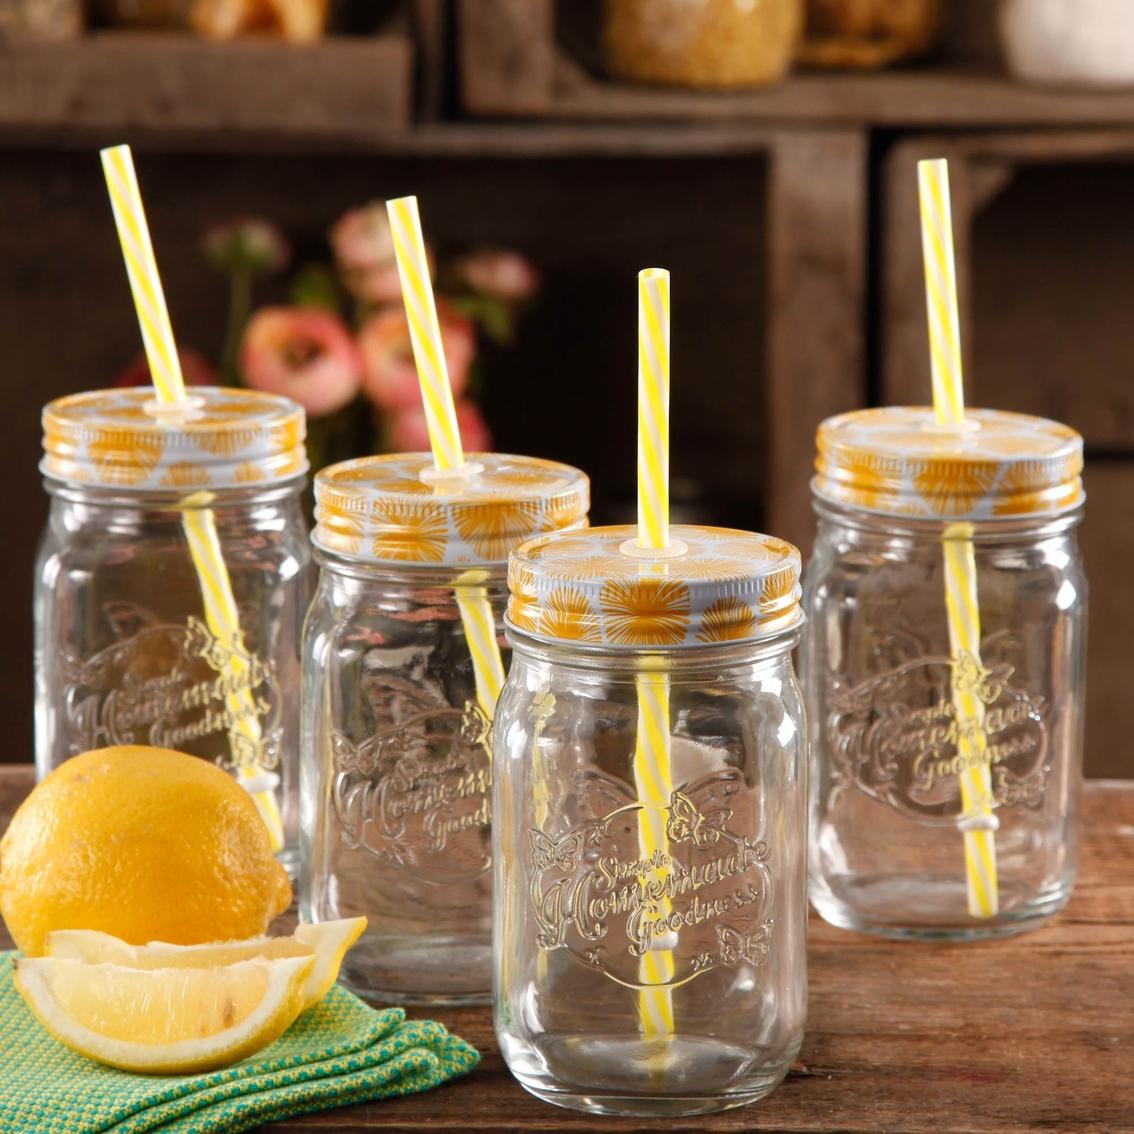 Pioneer Woman 16 Oz Mason Jar 4 Pk | Everyday Glassware ...